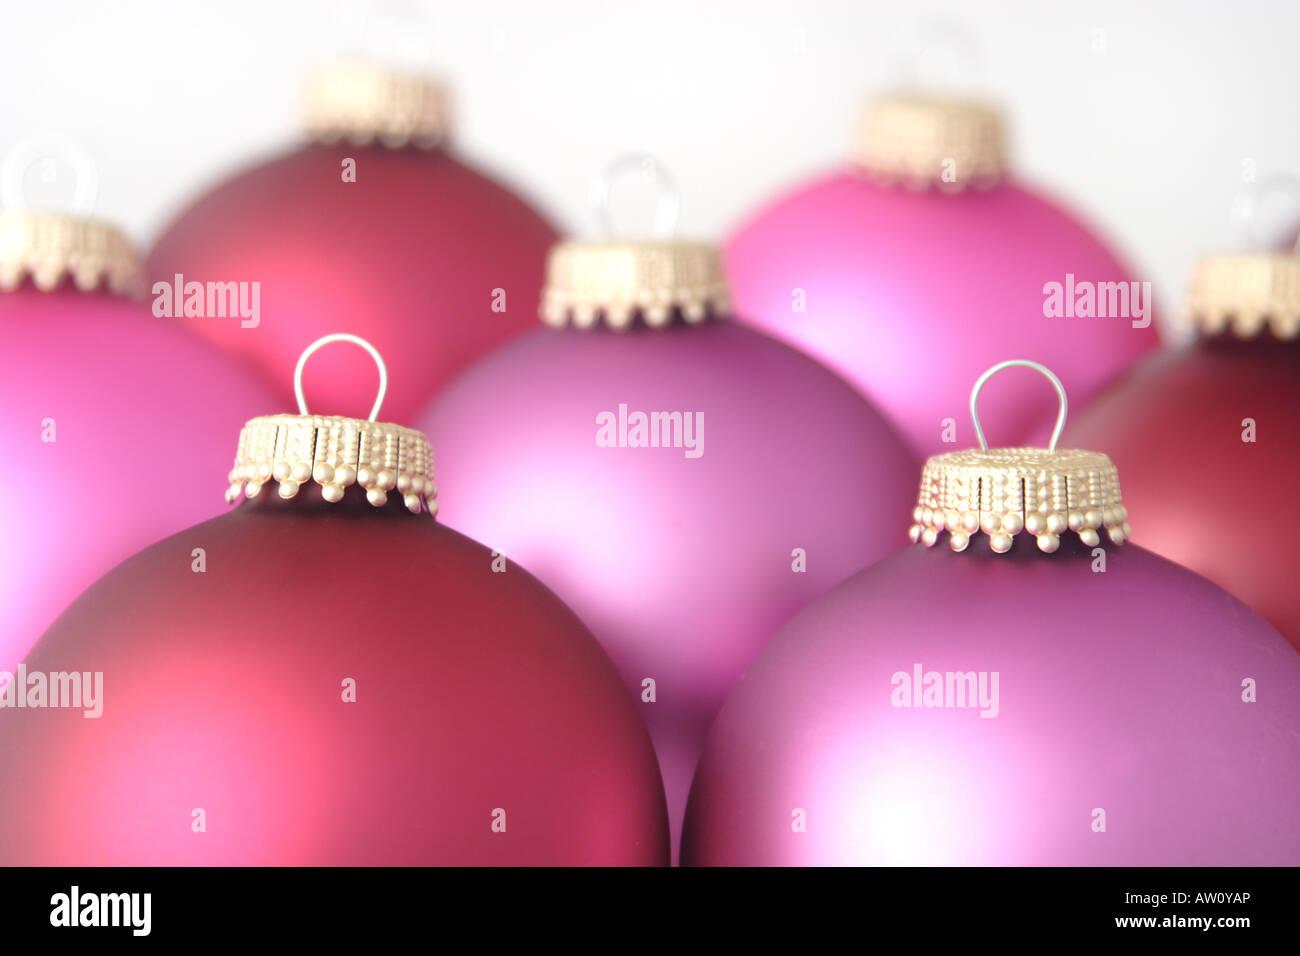 Rote Christbaumkugeln Glas.Rosa Und Rote Christbaumkugeln Stockfoto Bild 16429293 Alamy